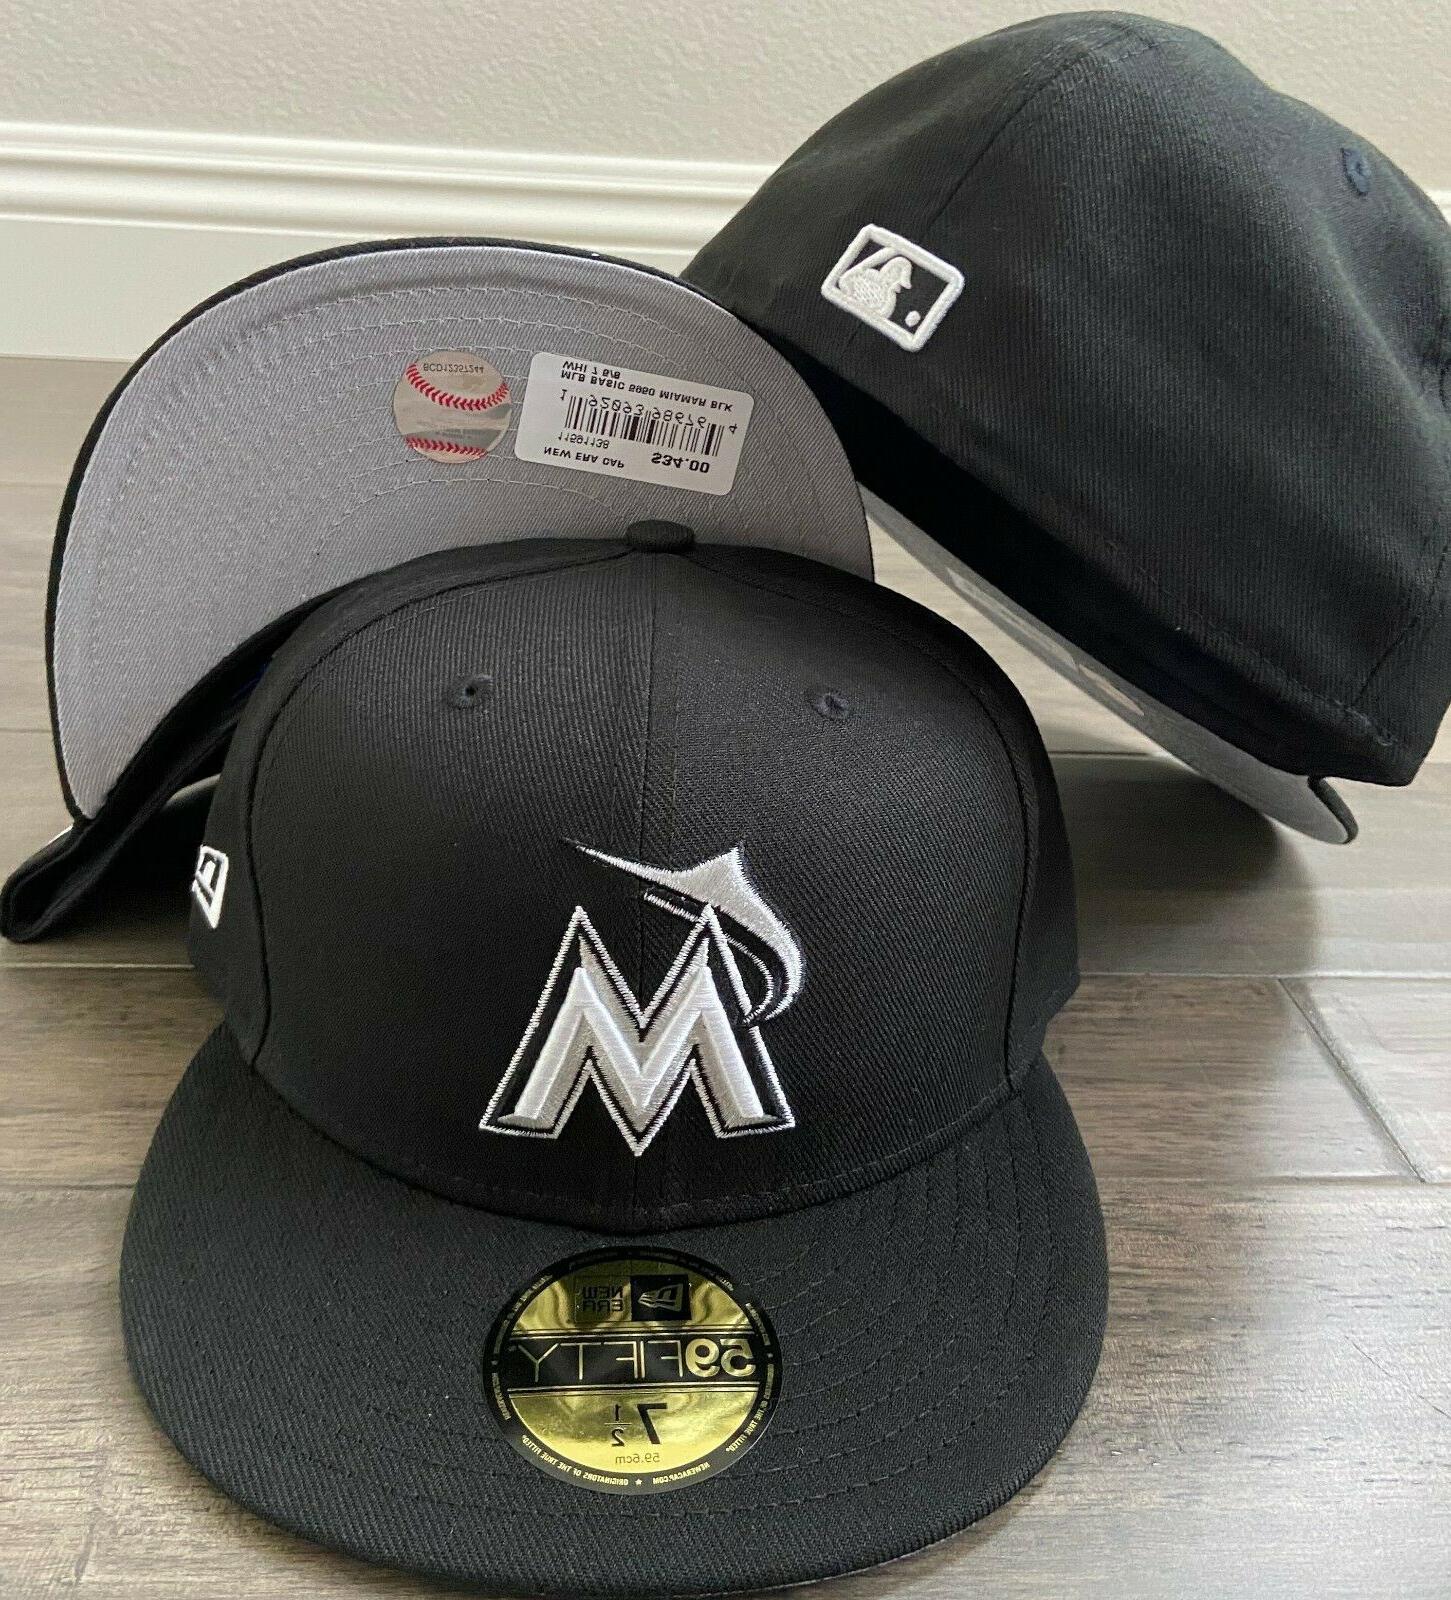 cap 59fifty miami marlins black white hat